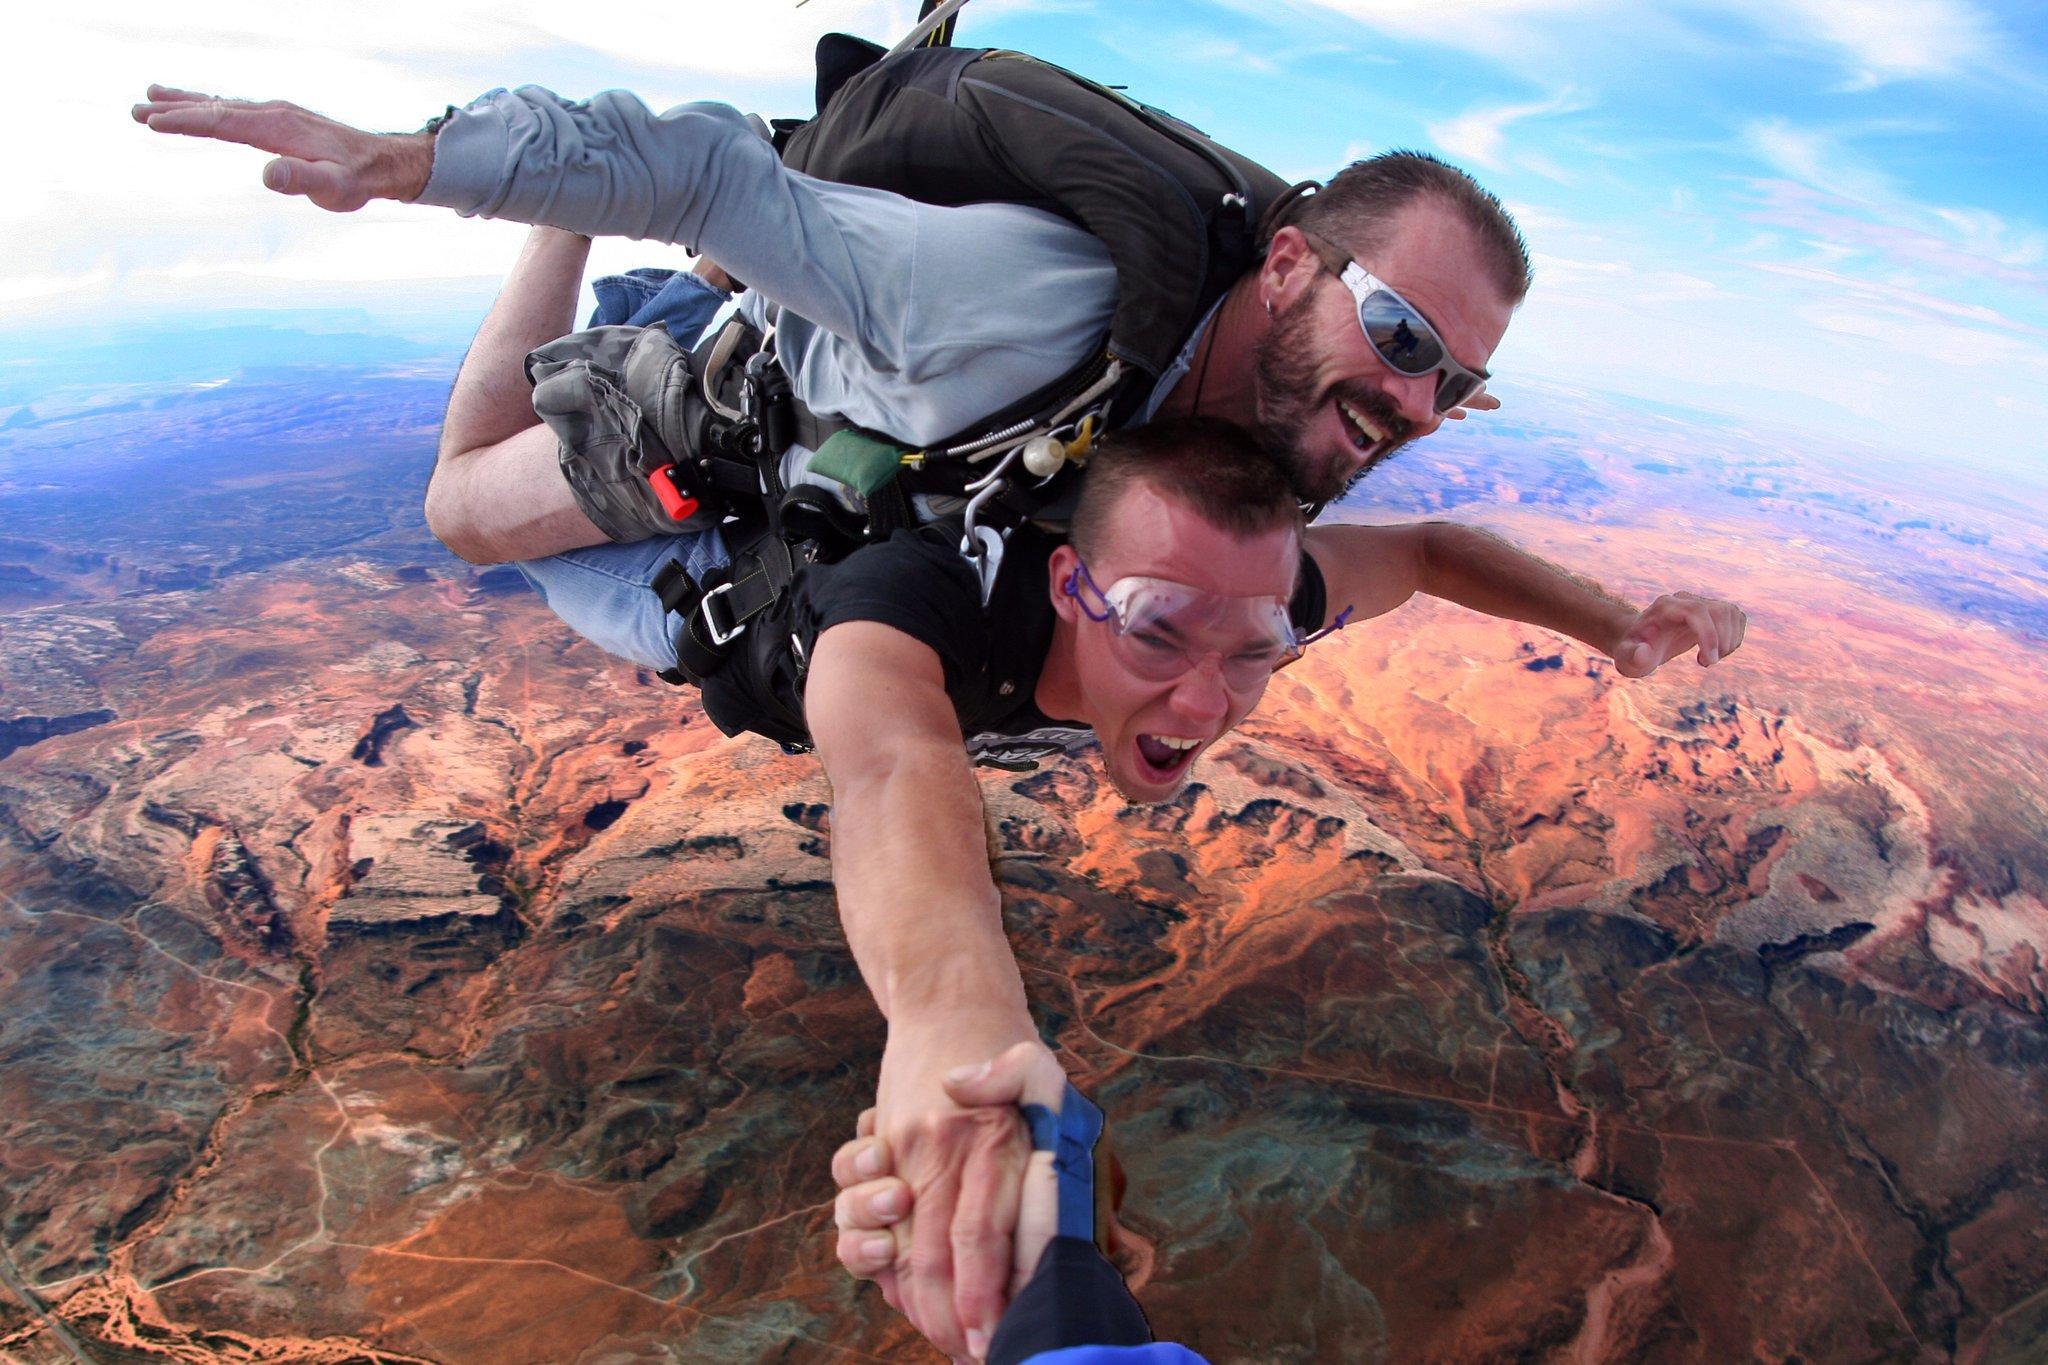 Skydive Canyonlands image 1